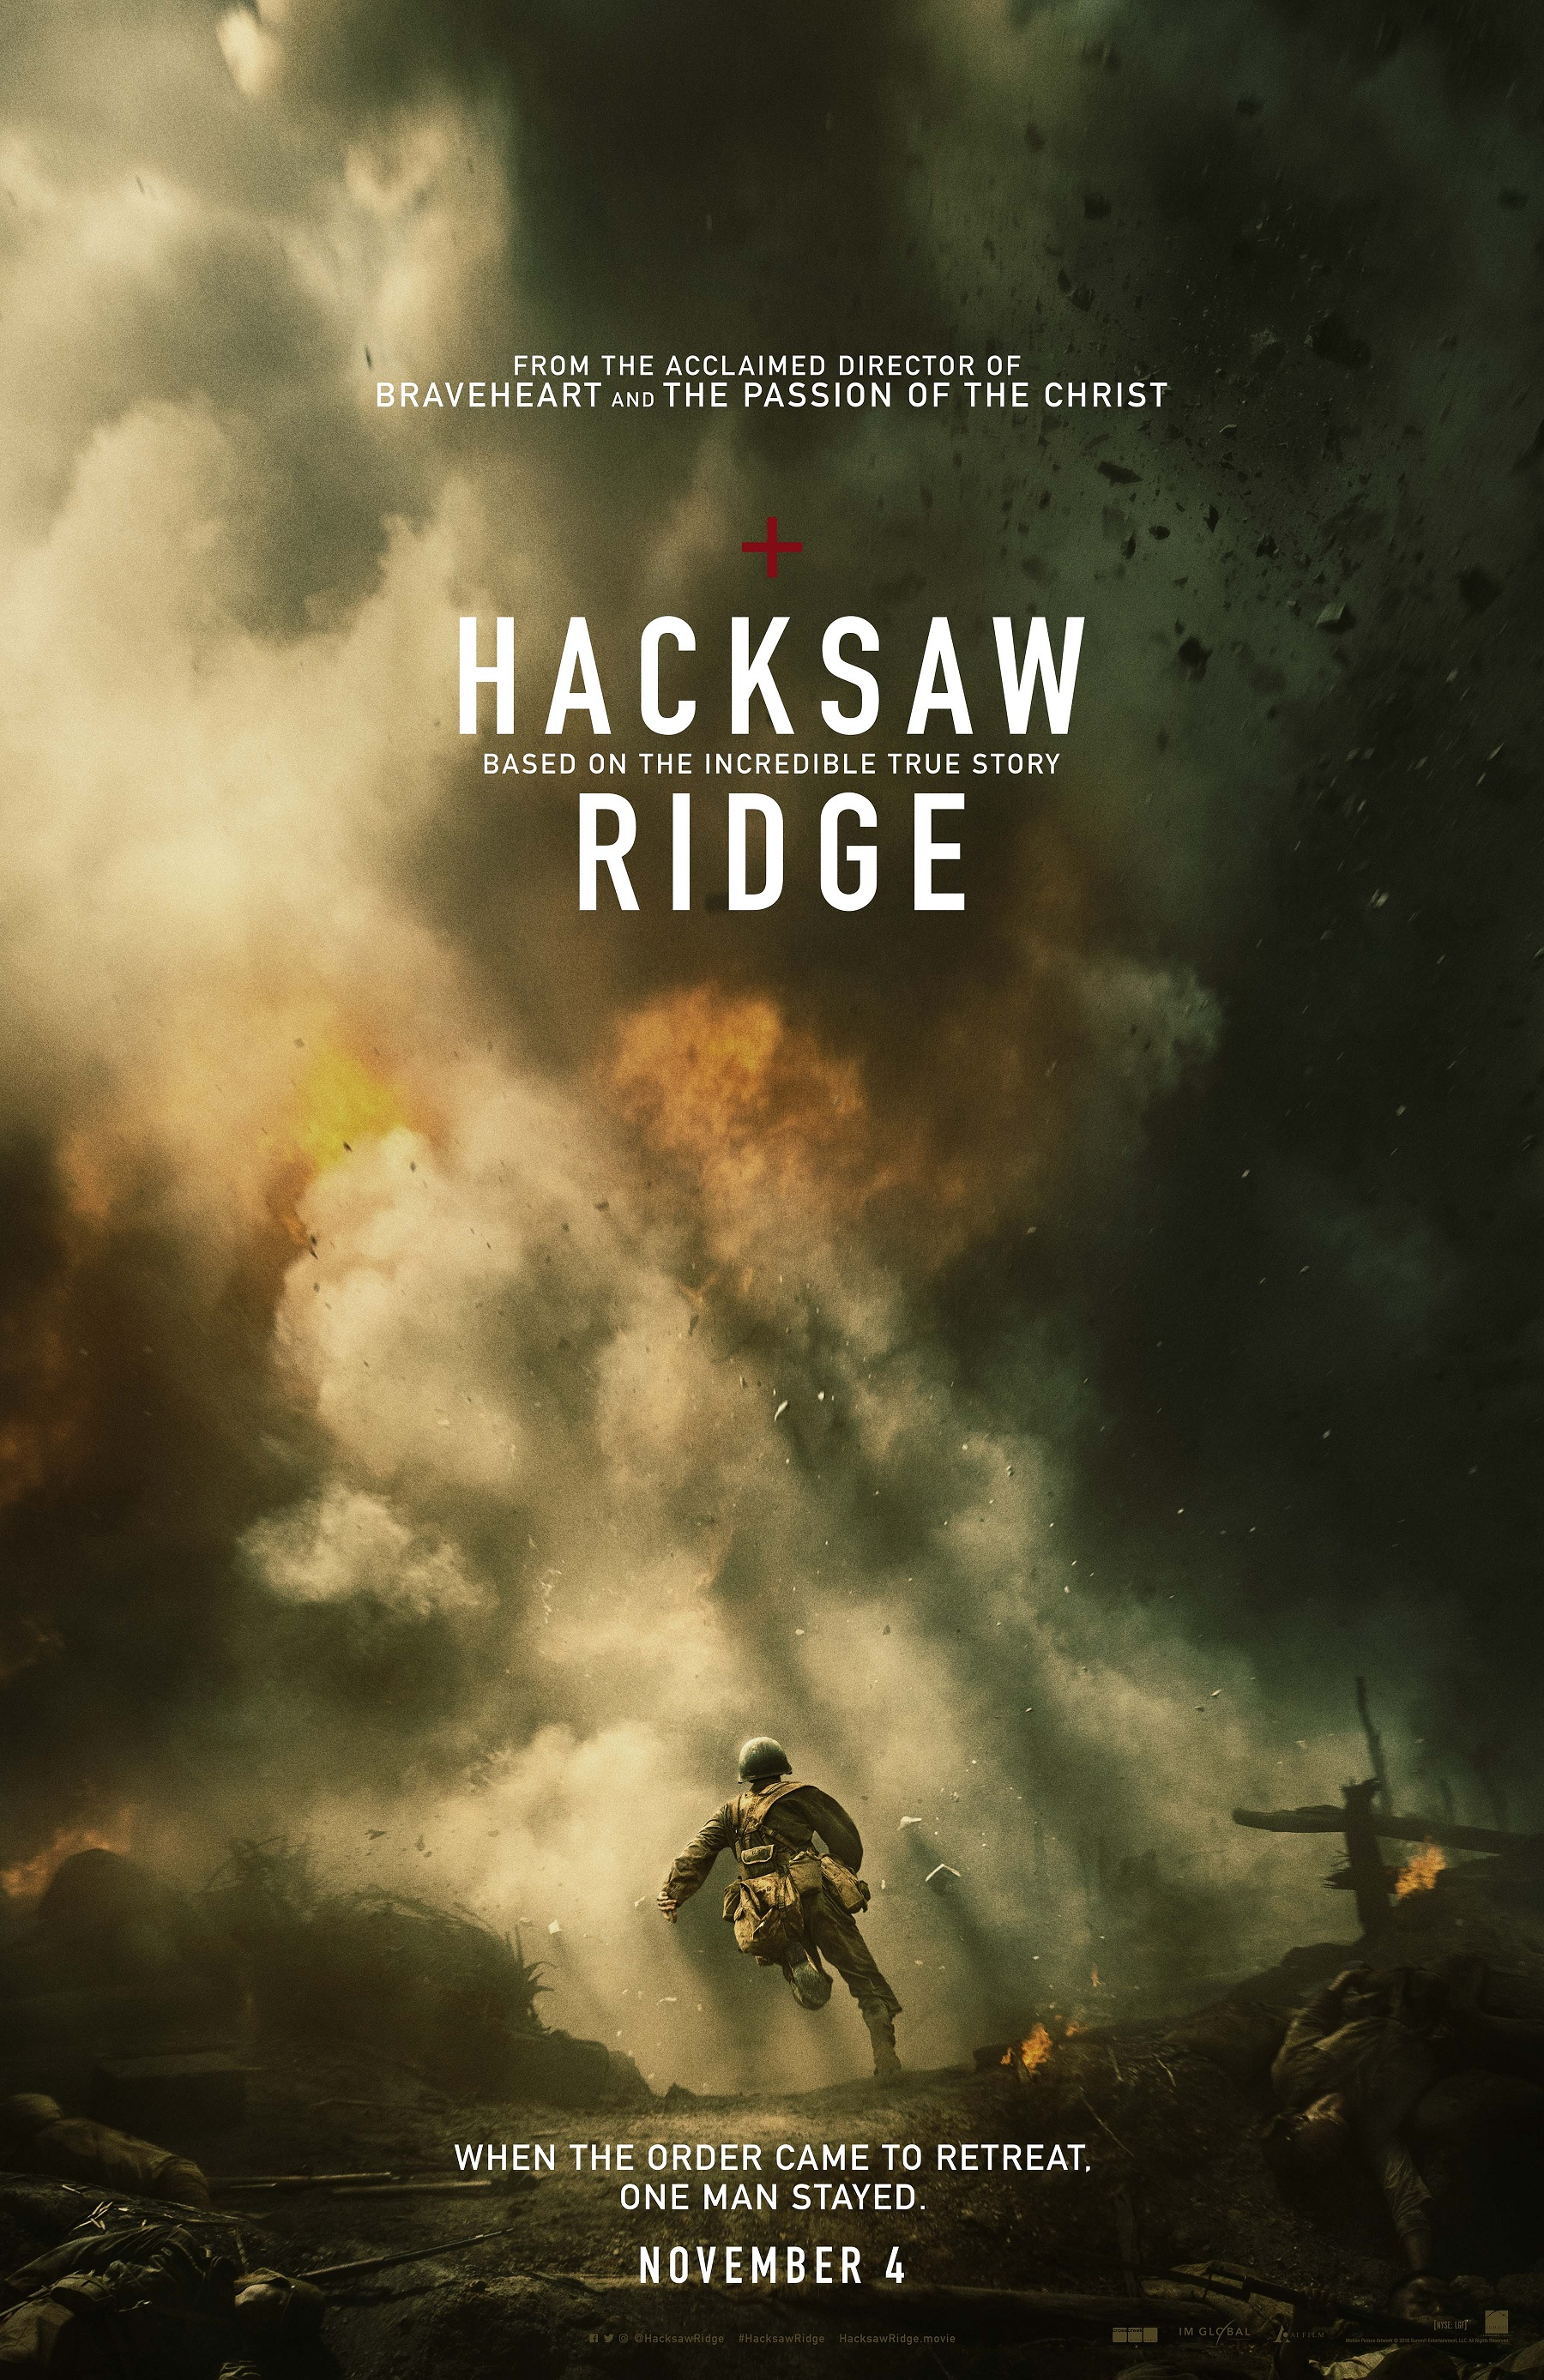 hacksaw-ridge-poster-gallery.jpg